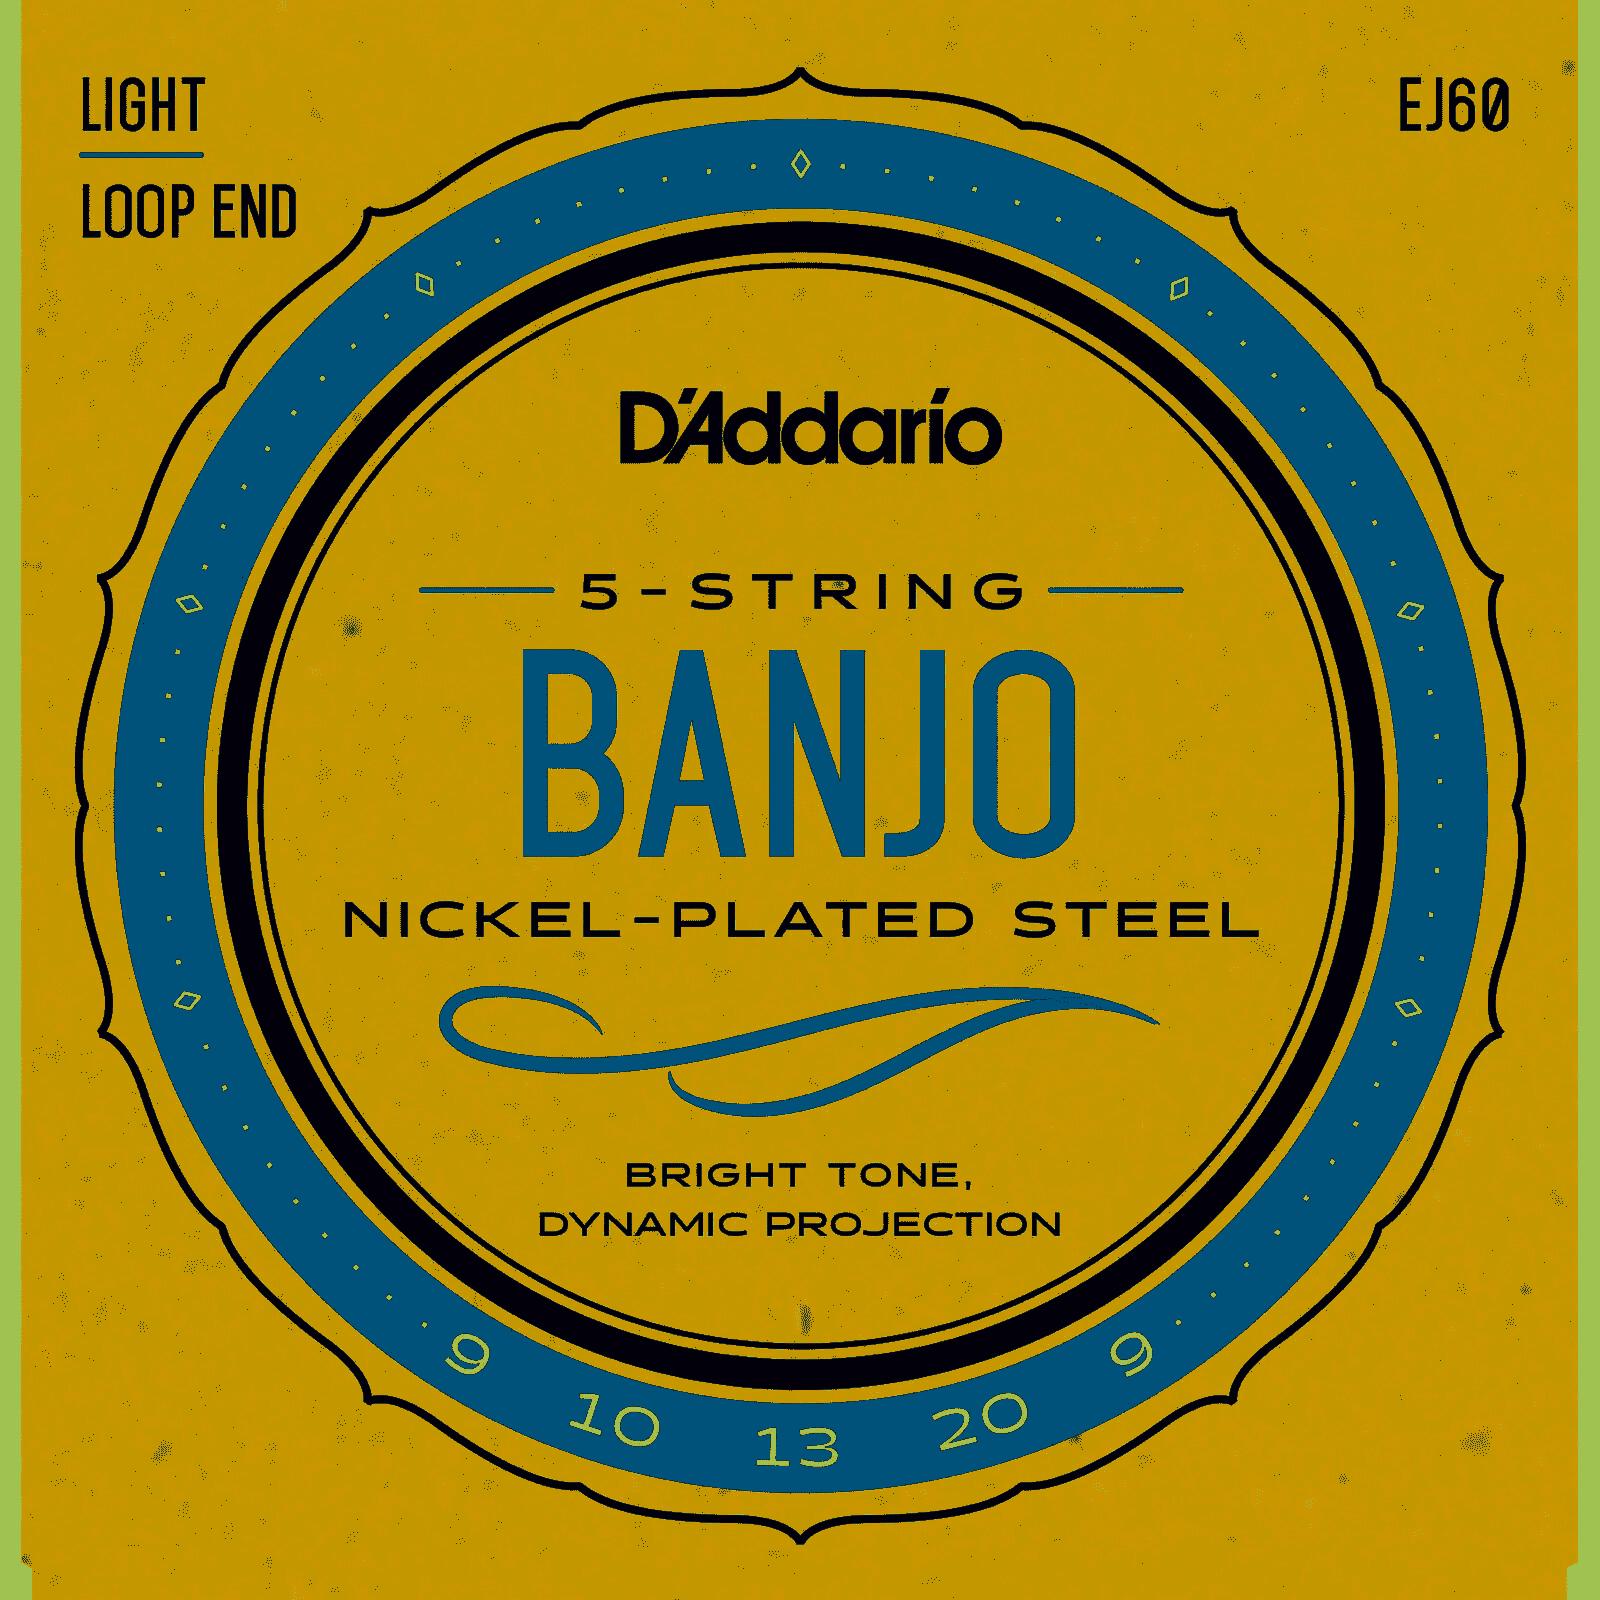 D'Addario EJ60 5 String Banjo Set Light Loop End